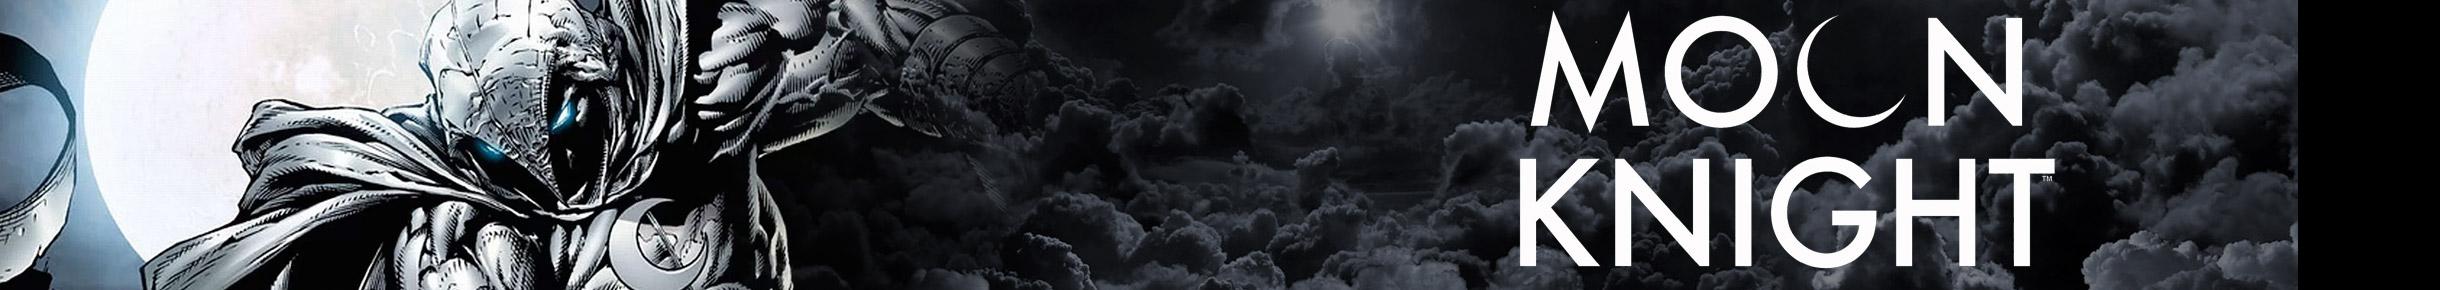 Moon Knight Merchandise Banner